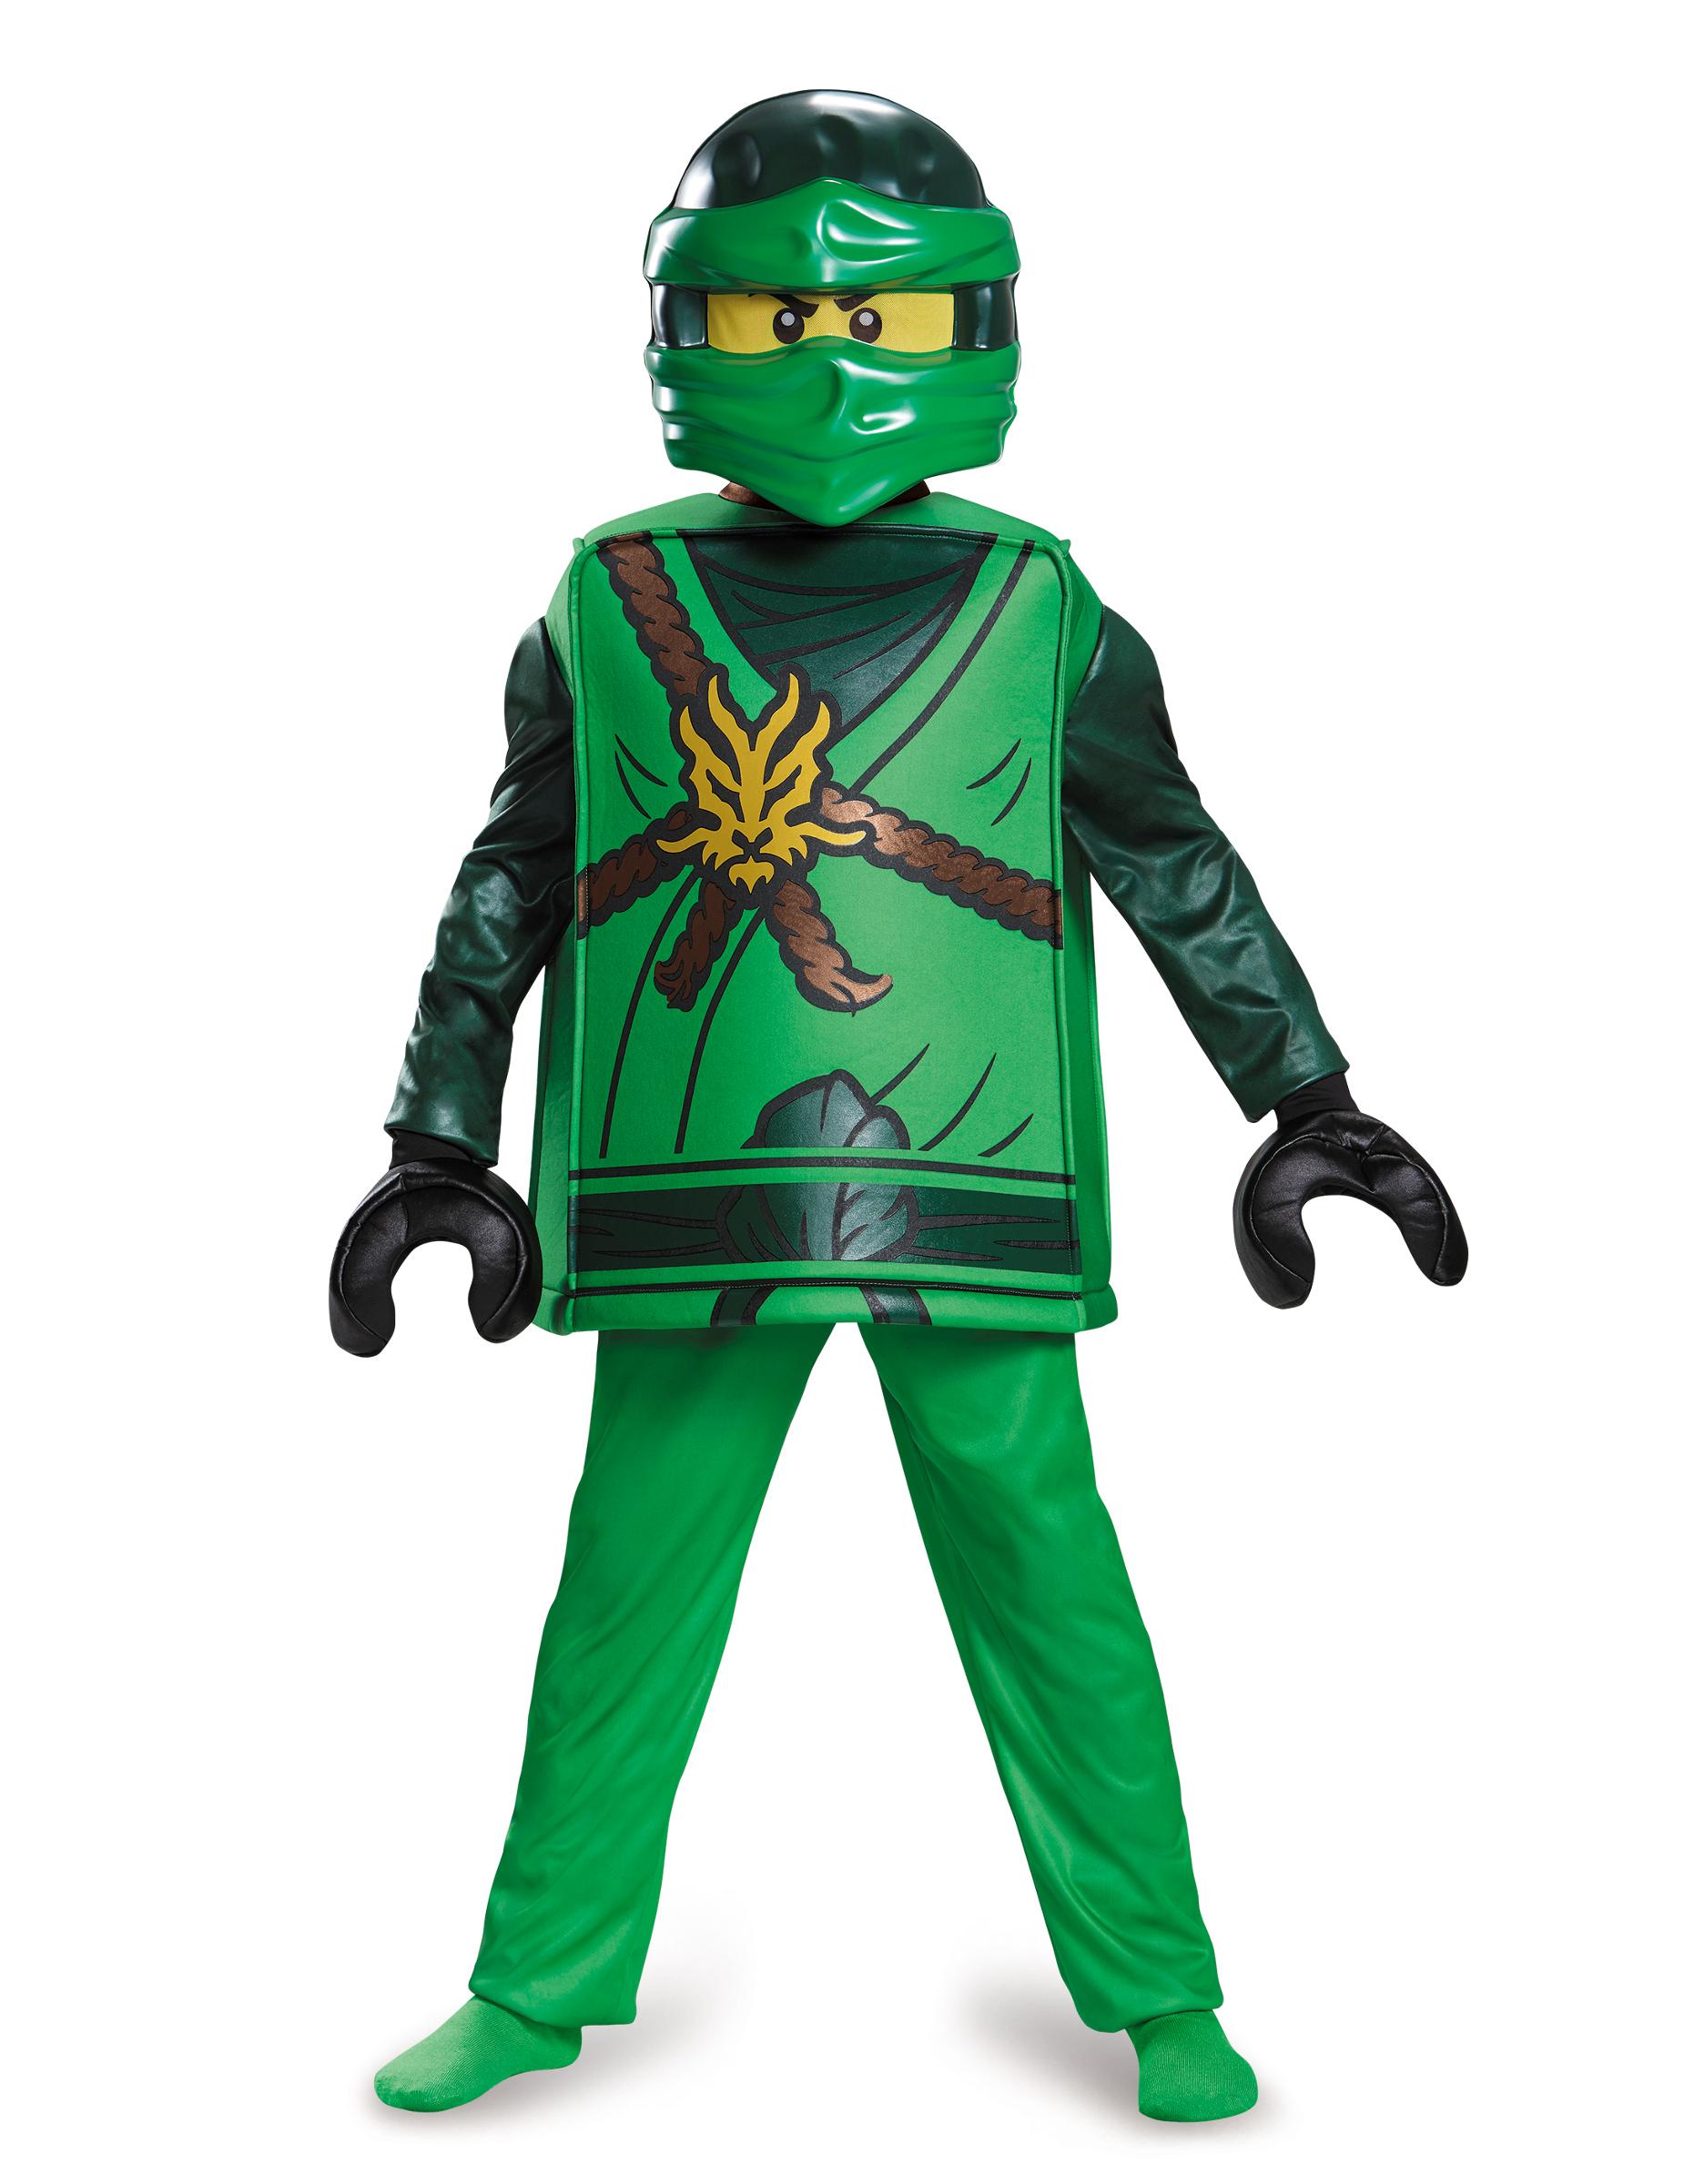 Lego Lloyd Ninjago Kinderkostum Ninja Grun Schwarz Gunstige